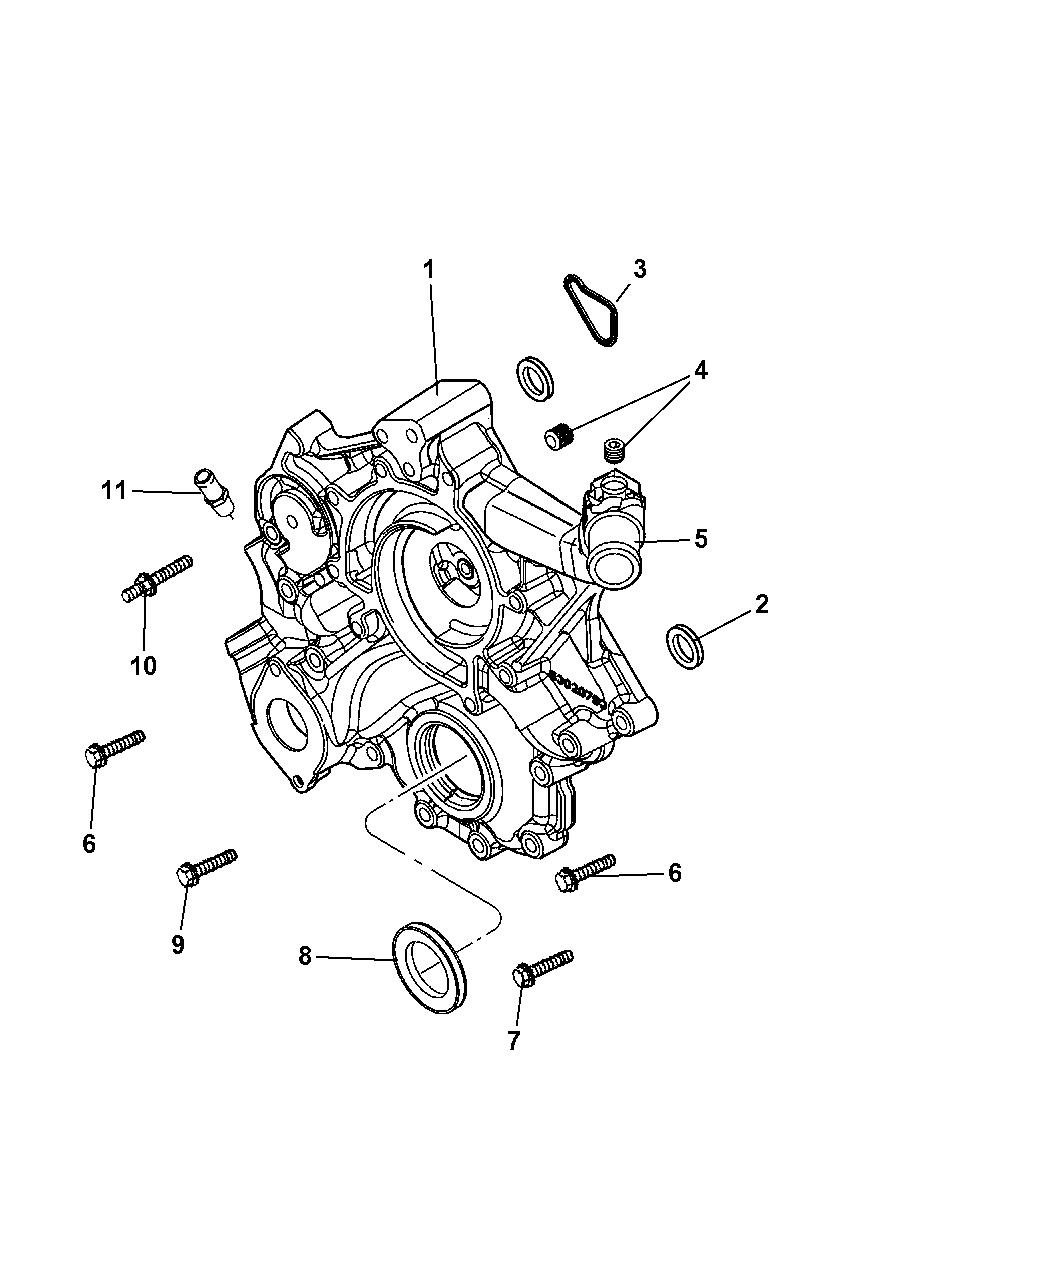 2007 dodge durango alternator